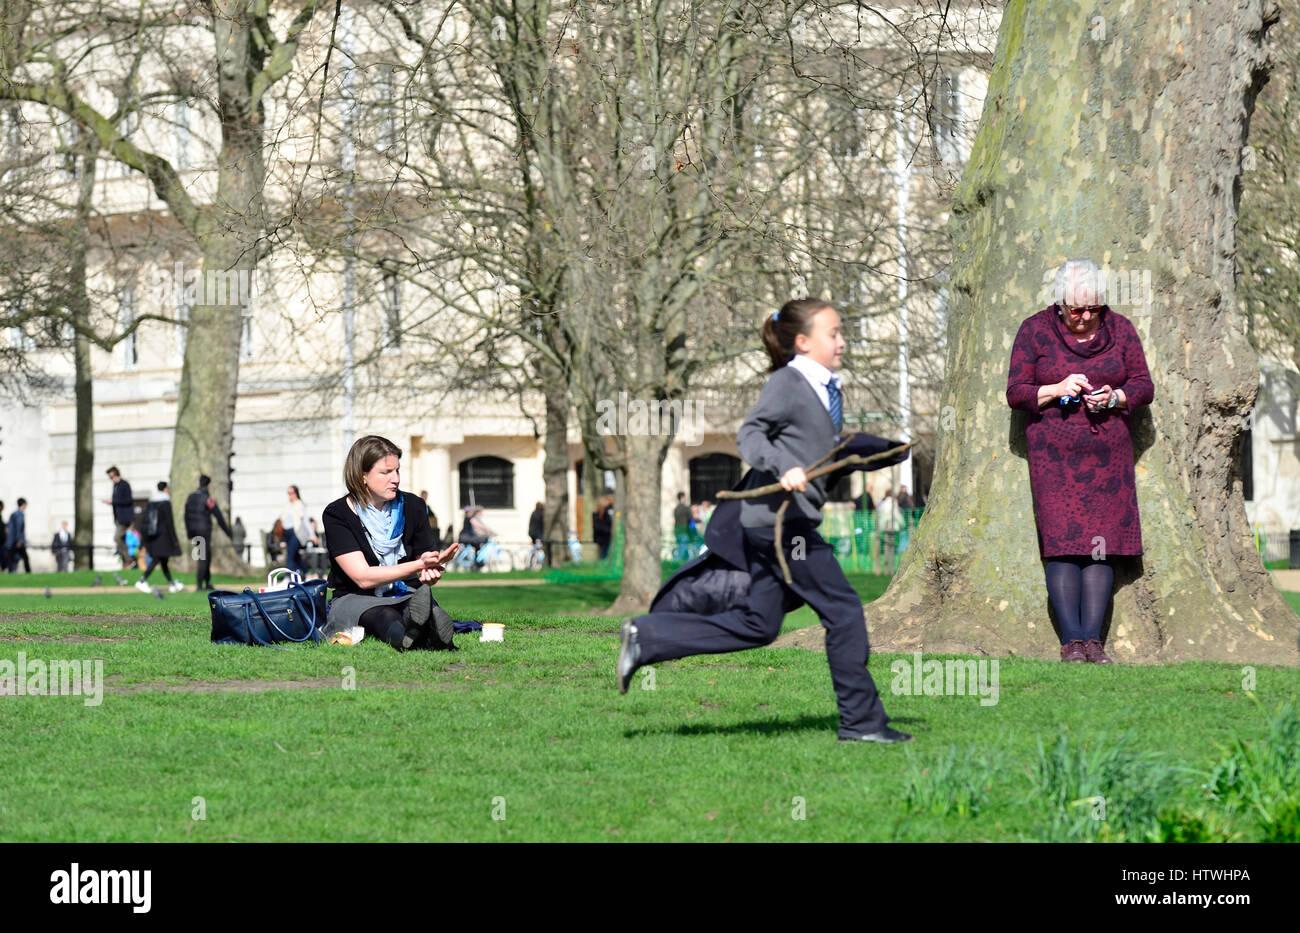 london-uk-three-generations-of-women-in-